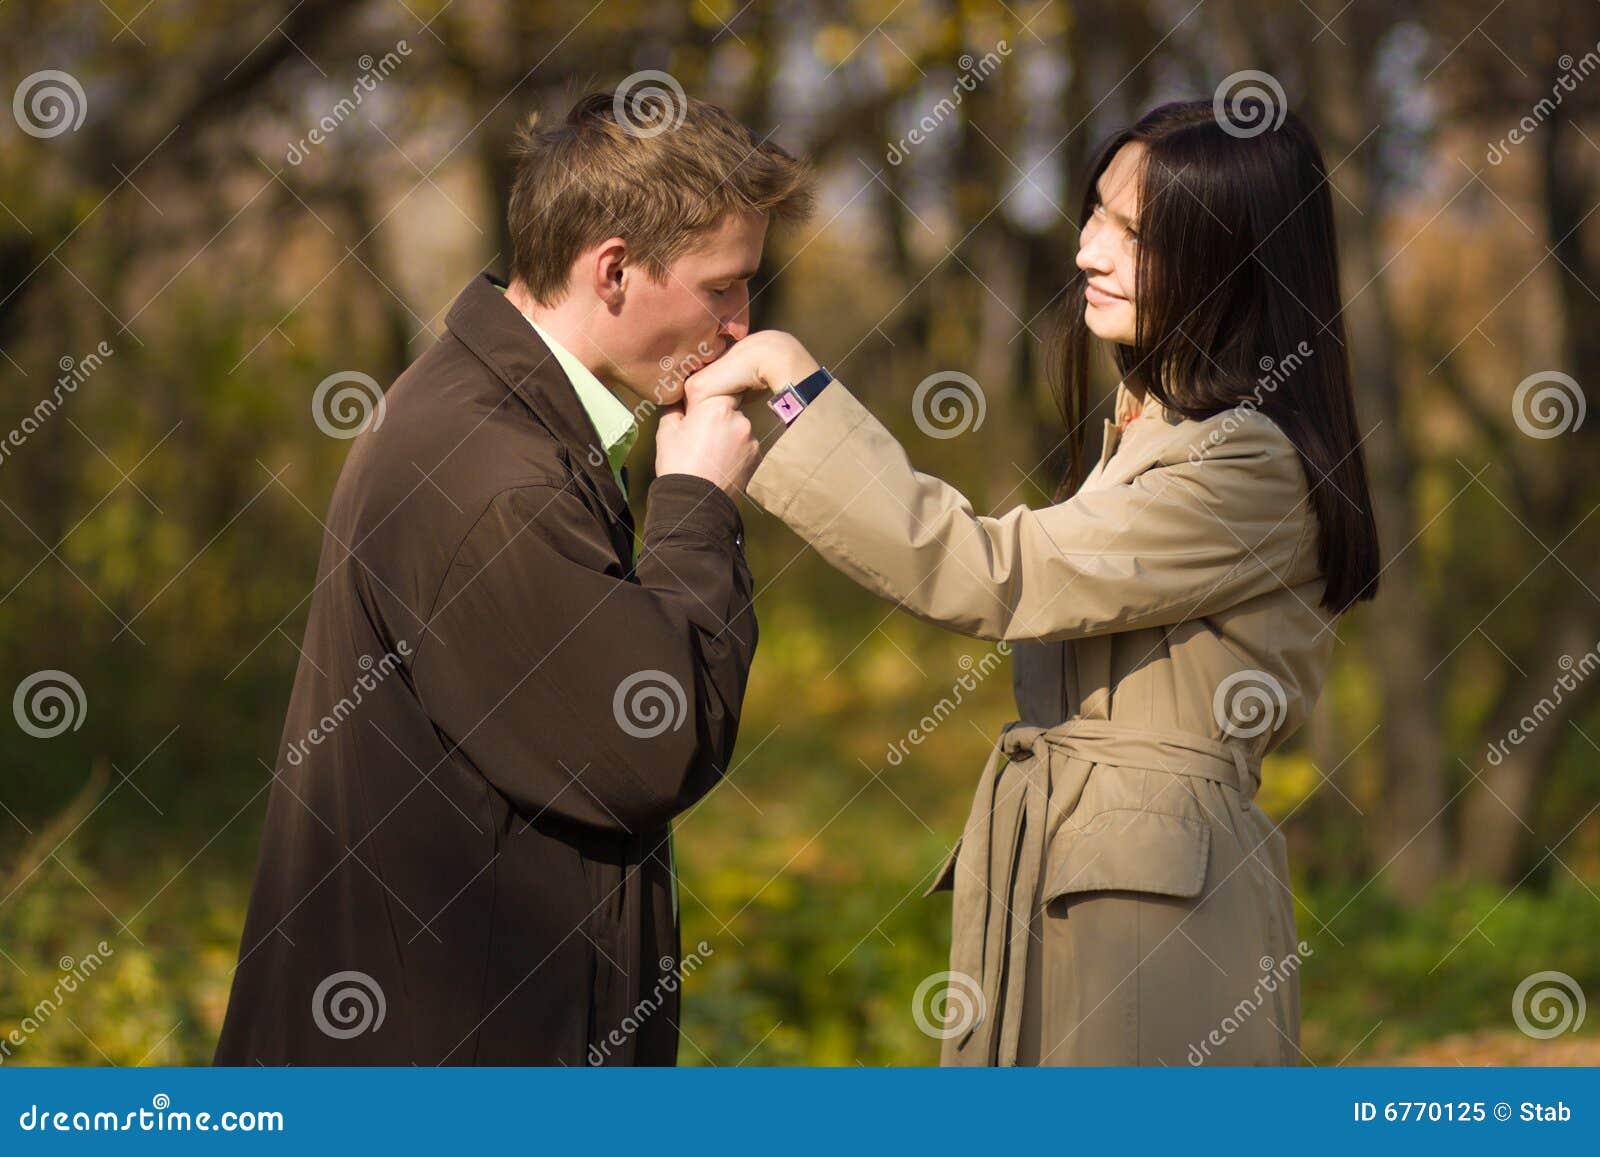 Девушка целует мужчине руки фото